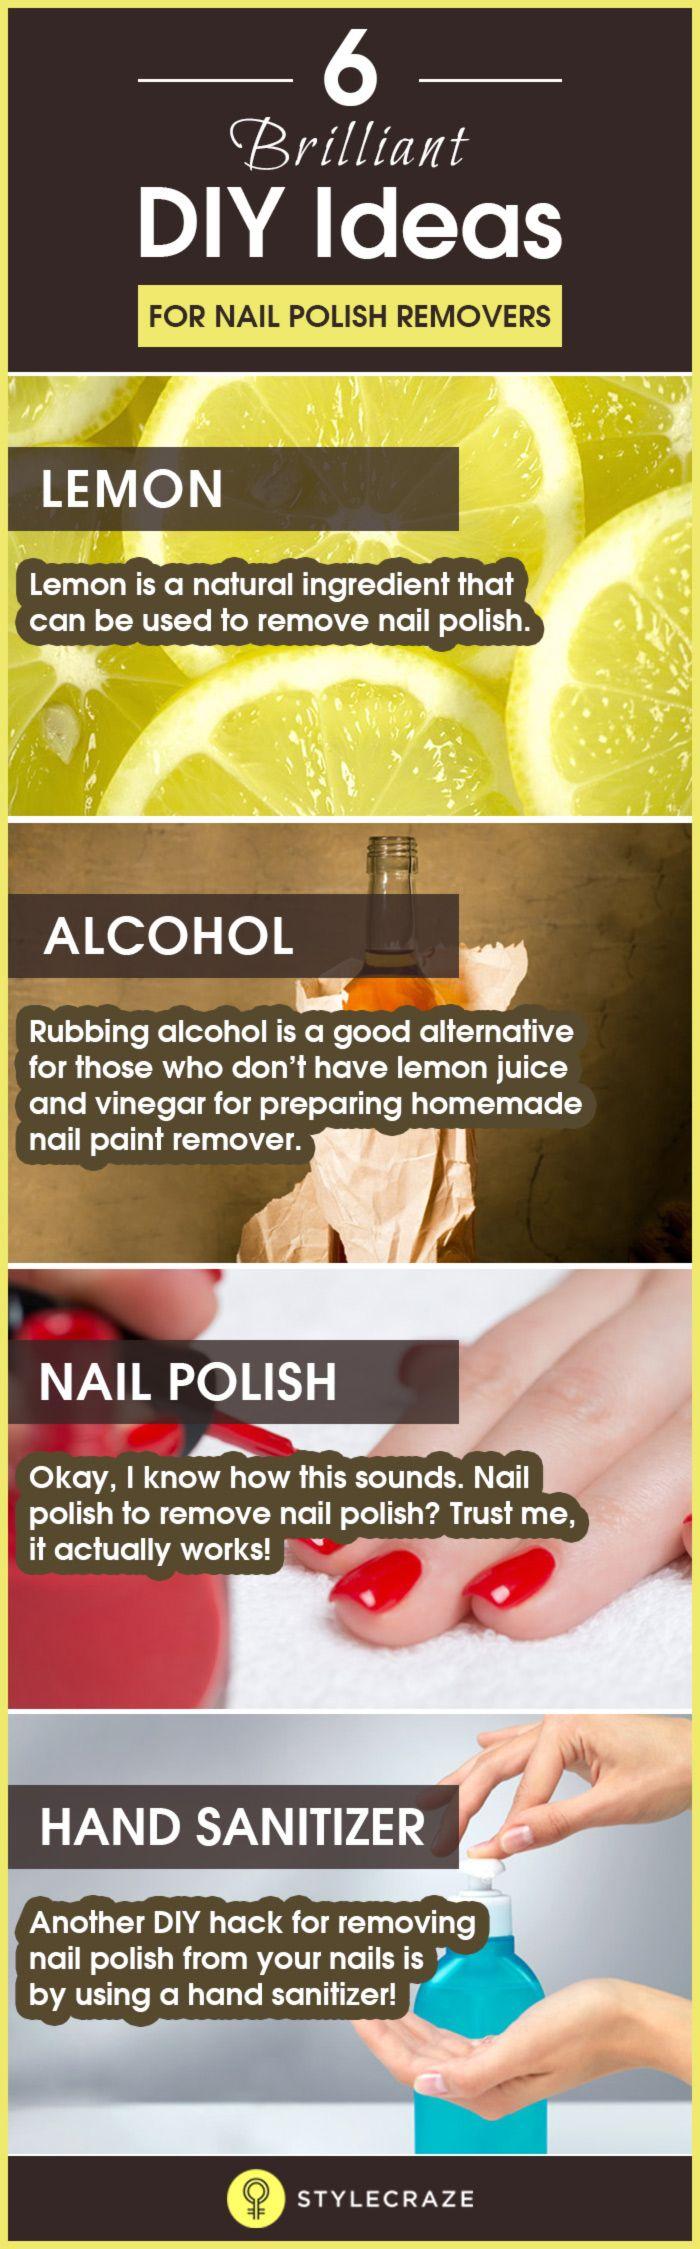 6 Best Diy Homemade Nail Polish Remover Recipes Homemade Nail Polish Homemade Nail Polish Remover Nail Polish Remover